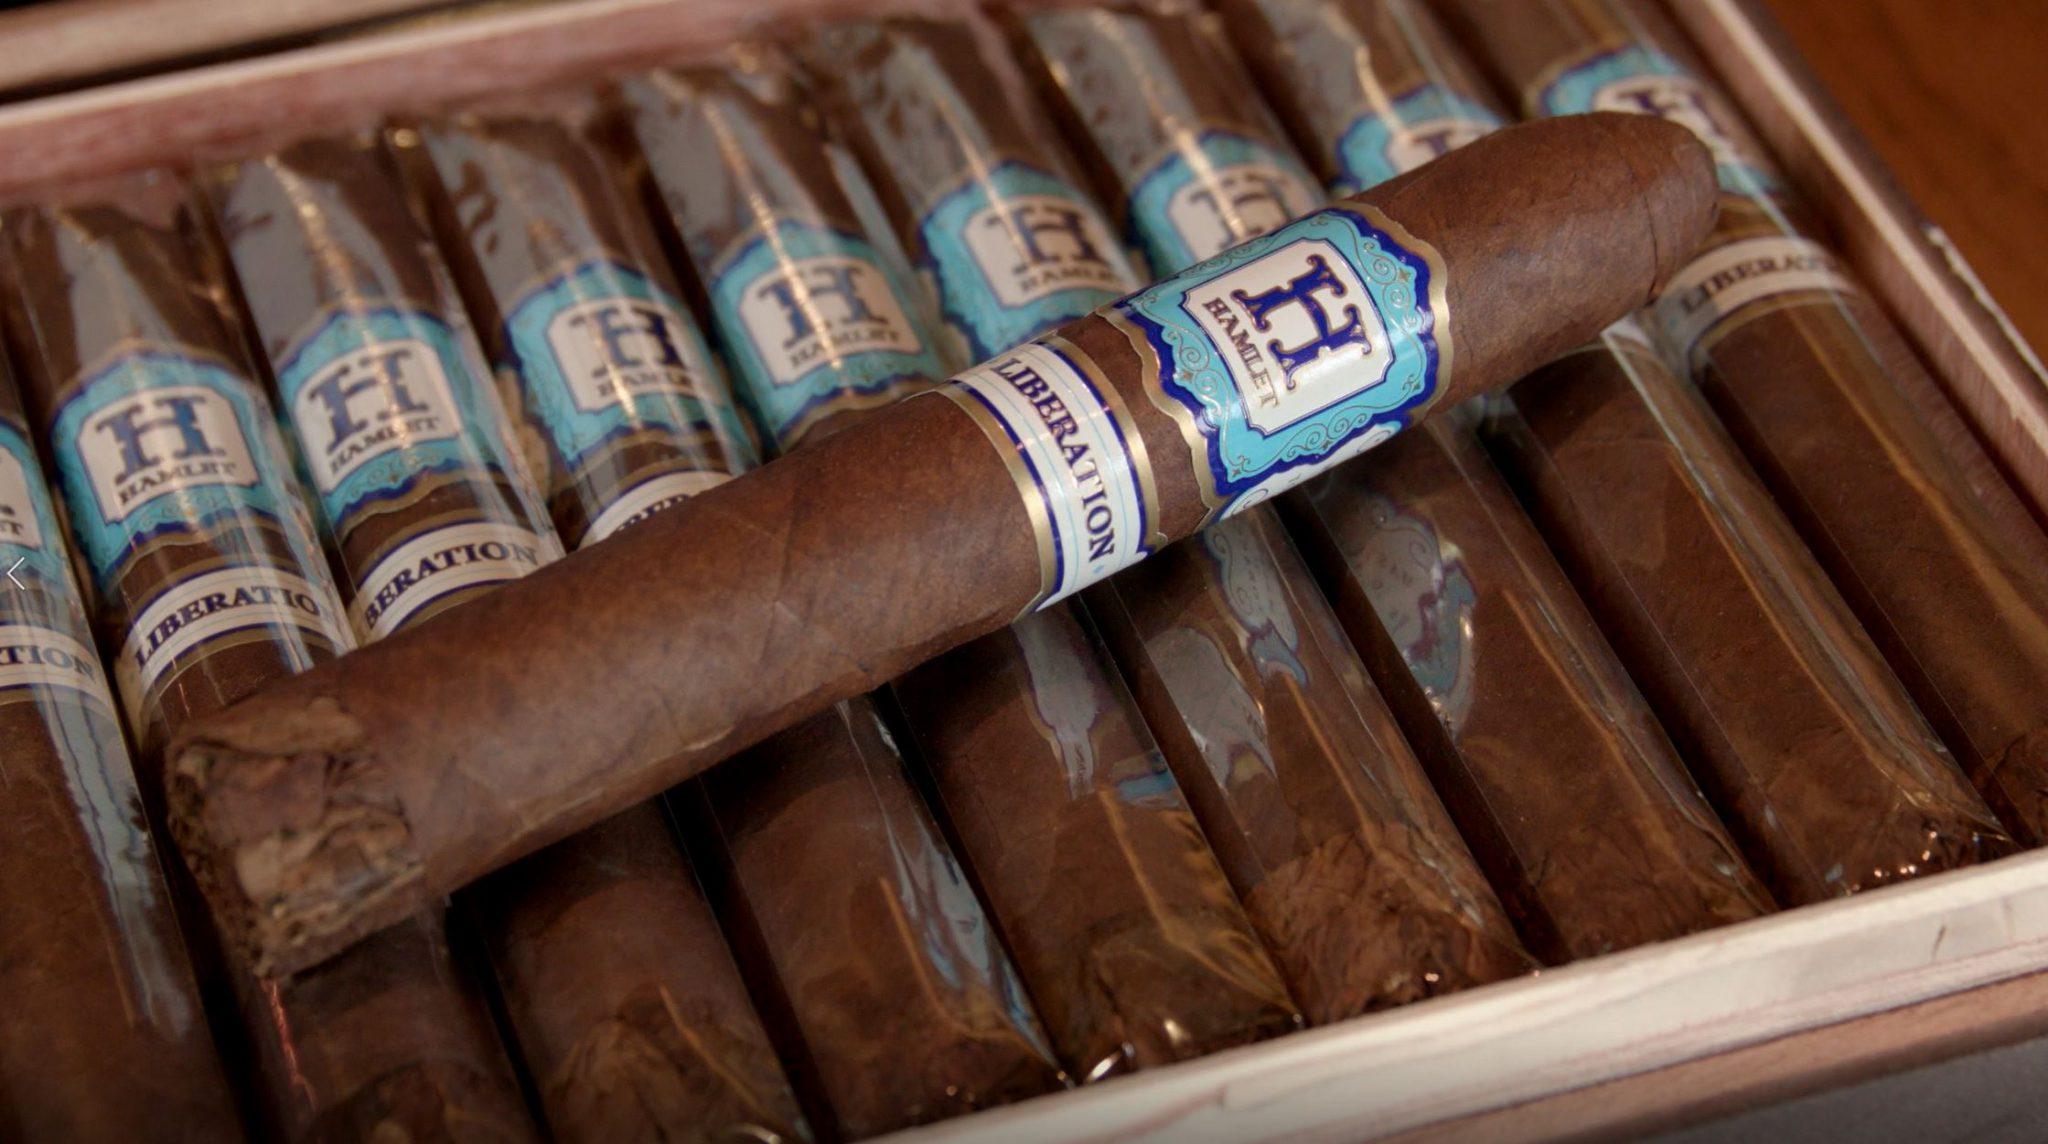 rocky patel hamlet Liberation cigar review by Cigar Advisor